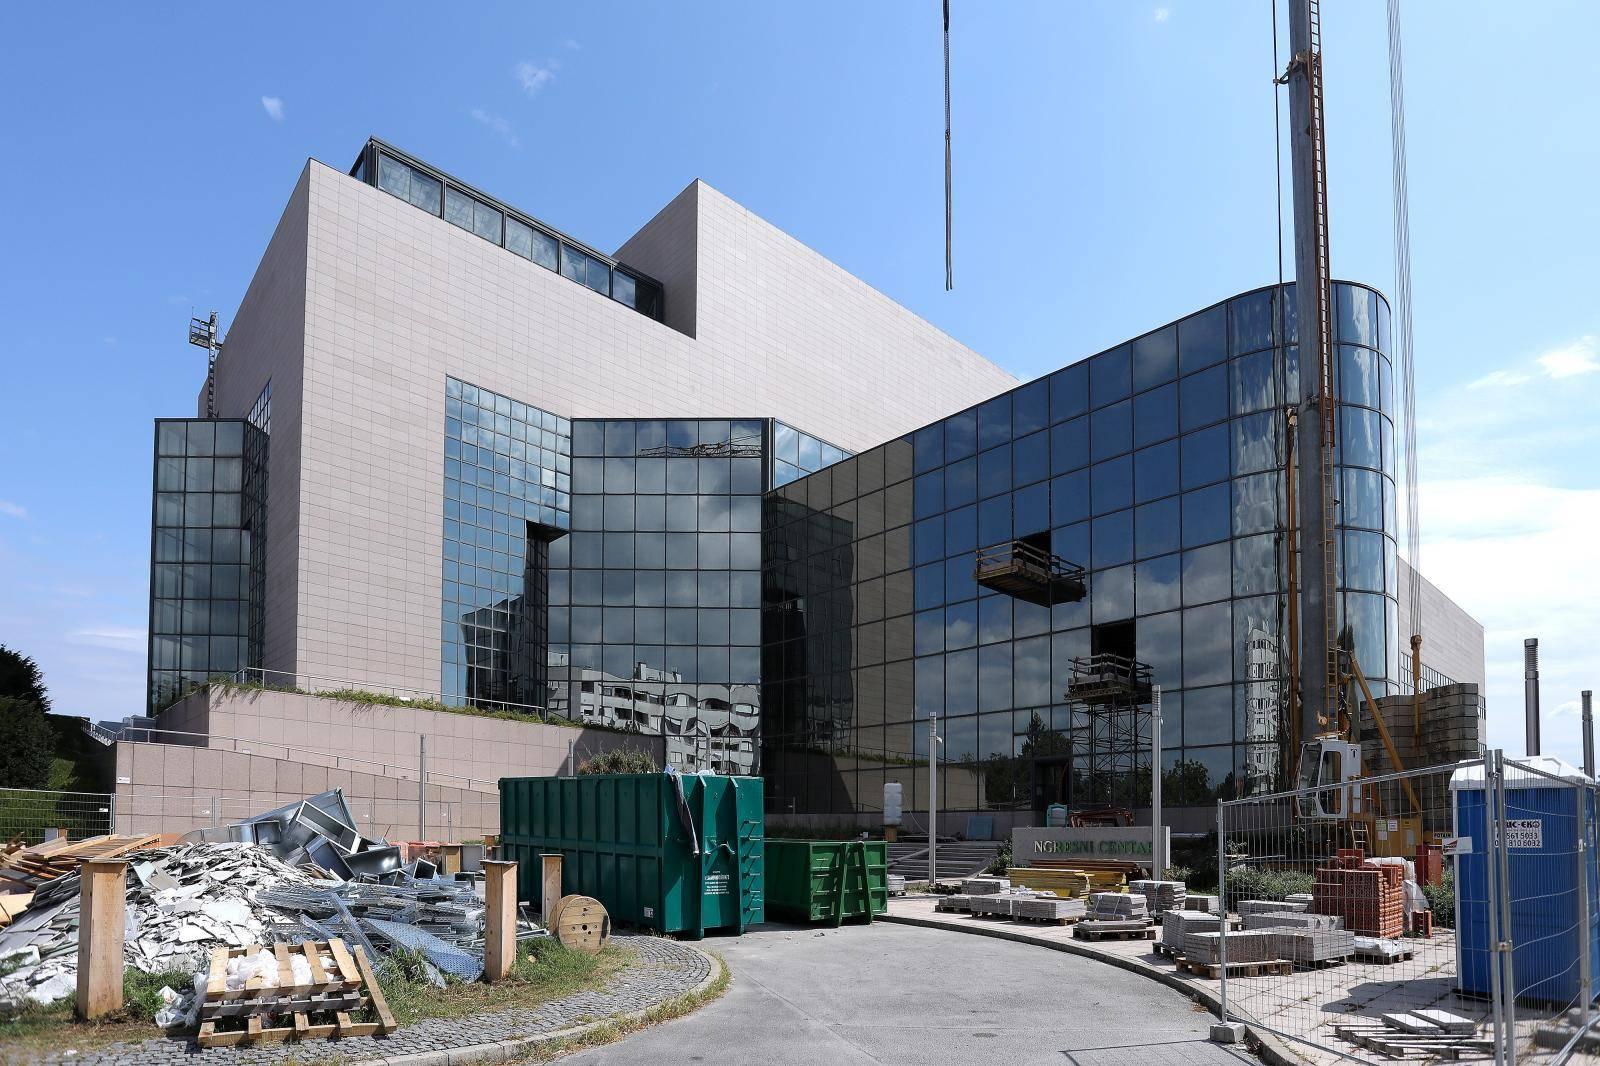 Zagreb: Radovi na uređenju Kongresnog centra NSK